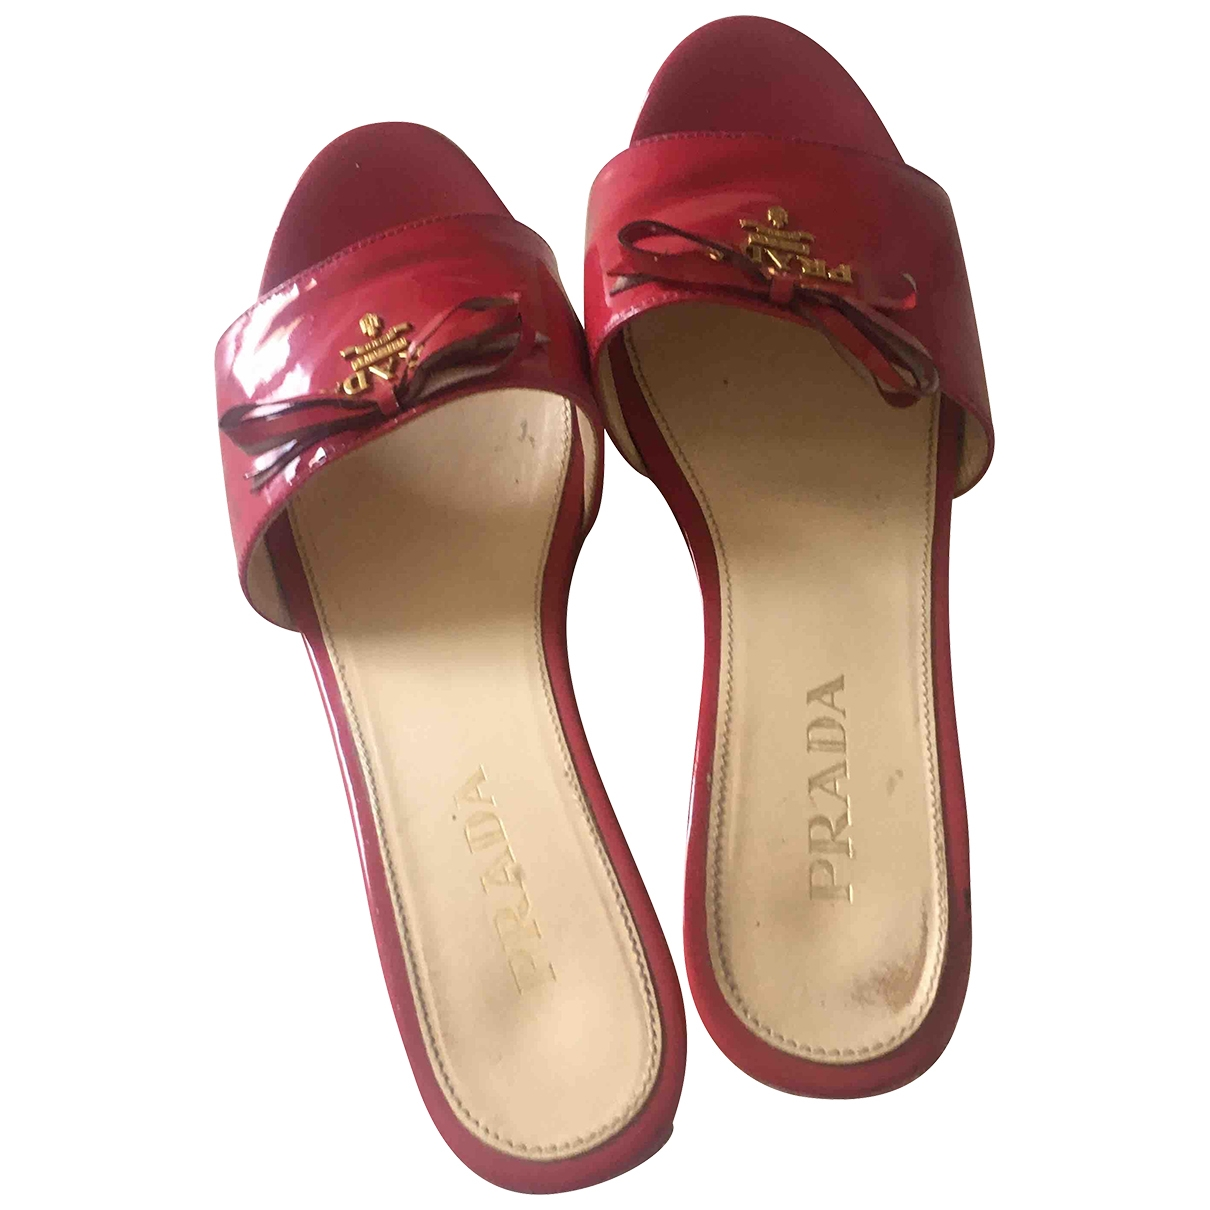 Prada \N Pink Patent leather Mules & Clogs for Women 35.5 EU